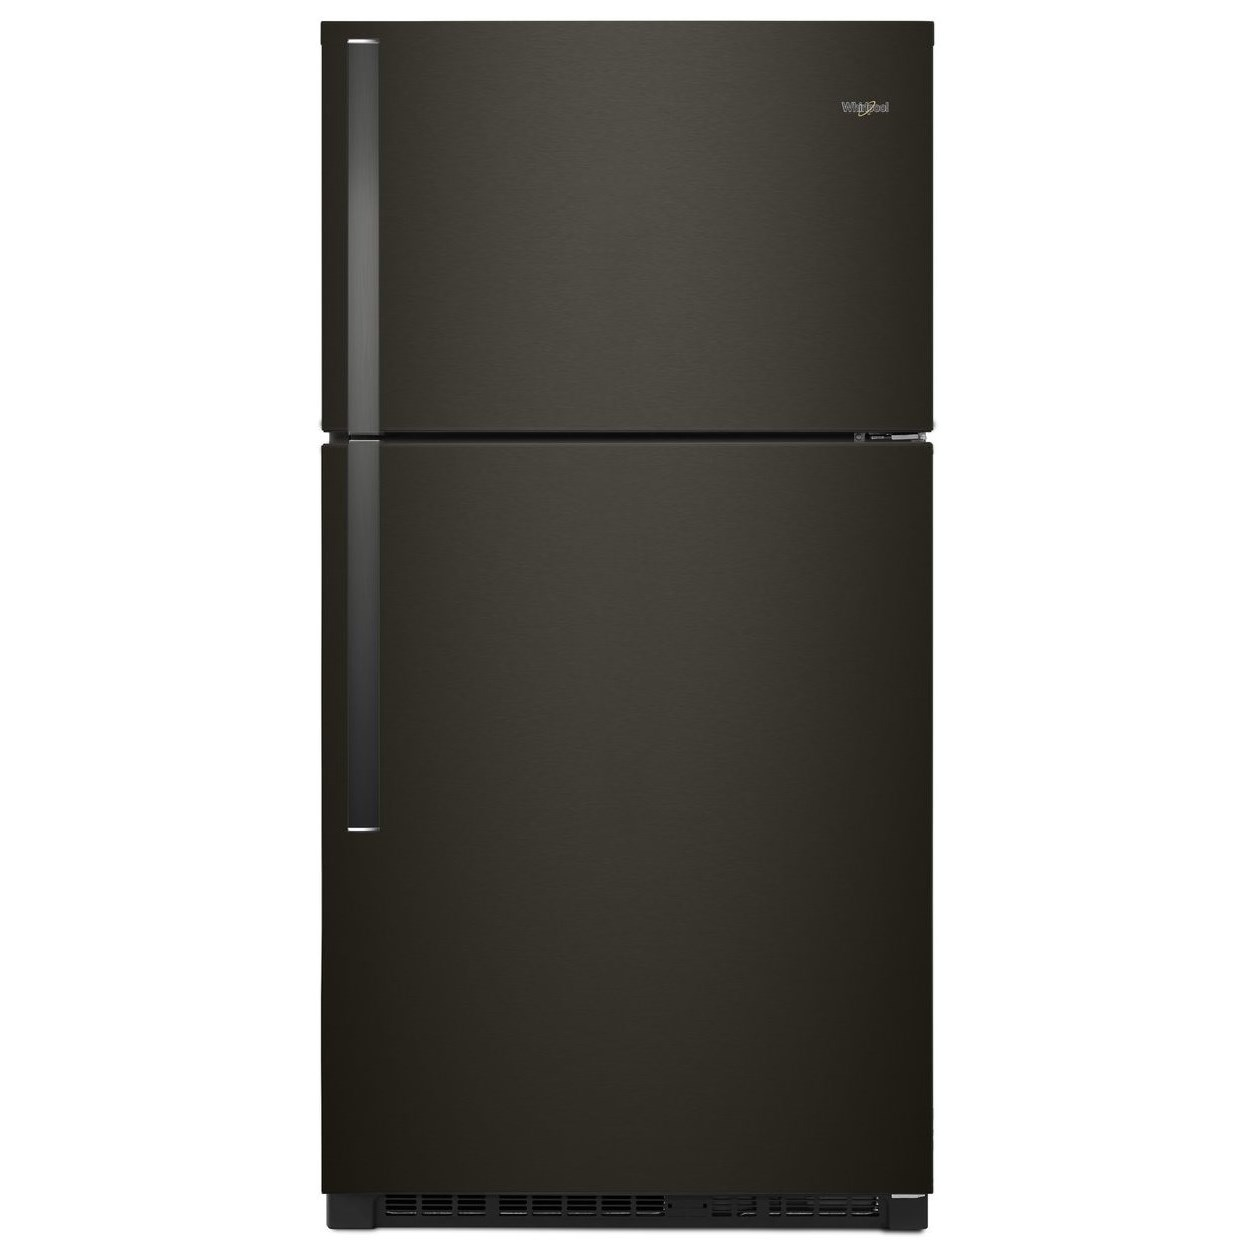 "Top Mount Refrigerators 33"" Wide 21 Cu. Ft. Top Freezer Refrigerator by Whirlpool at Pedigo Furniture"